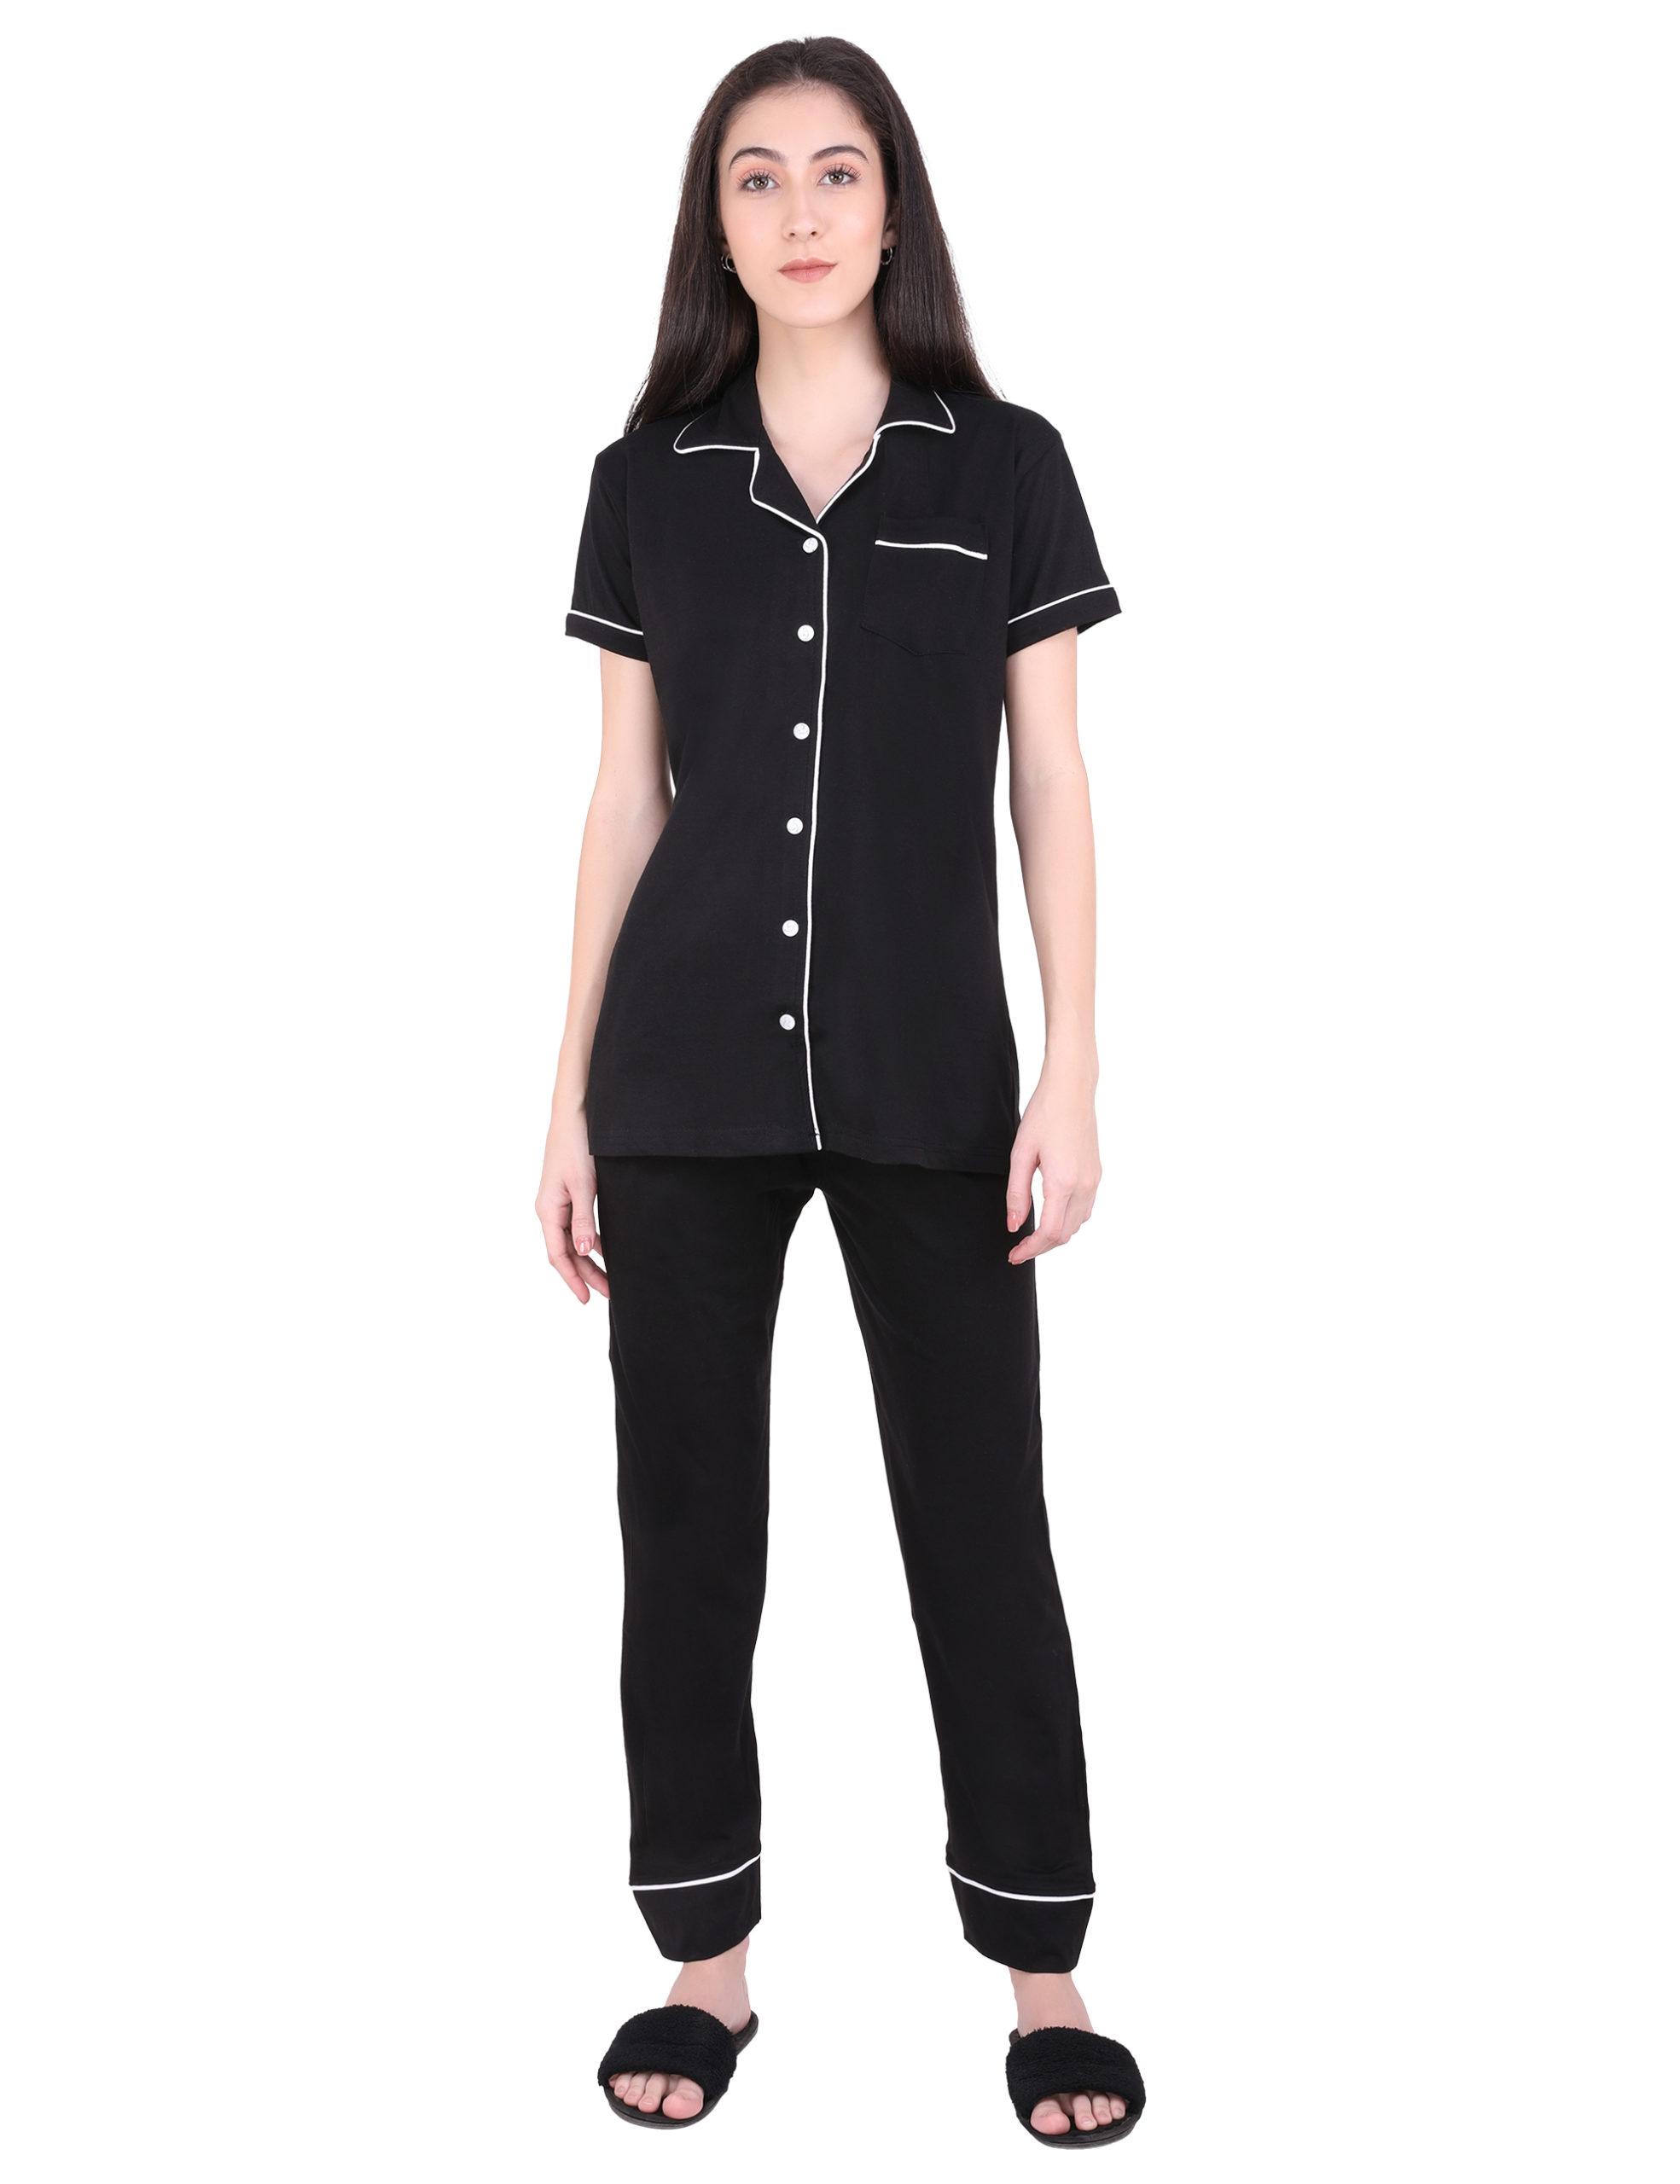 Solid Black Pajama Night Suit Set